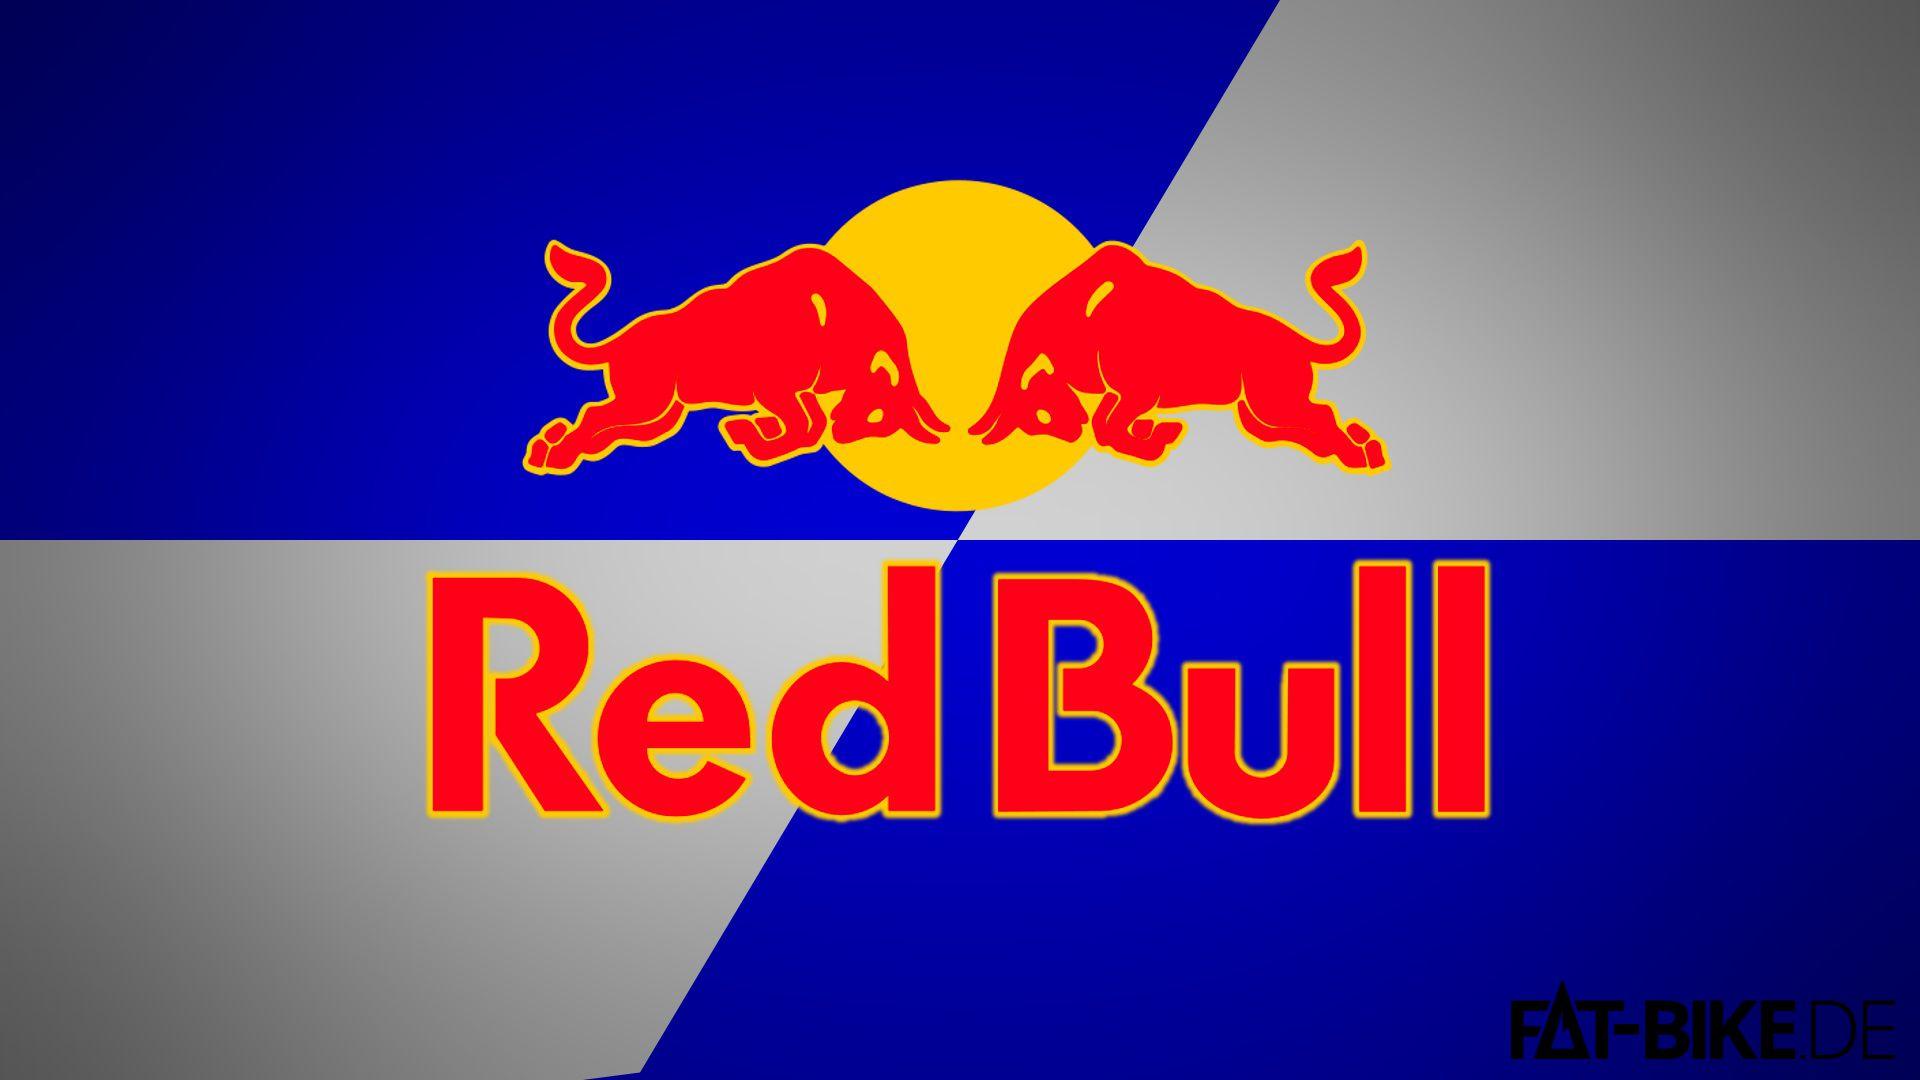 FATBike Transalp meets Red Bull